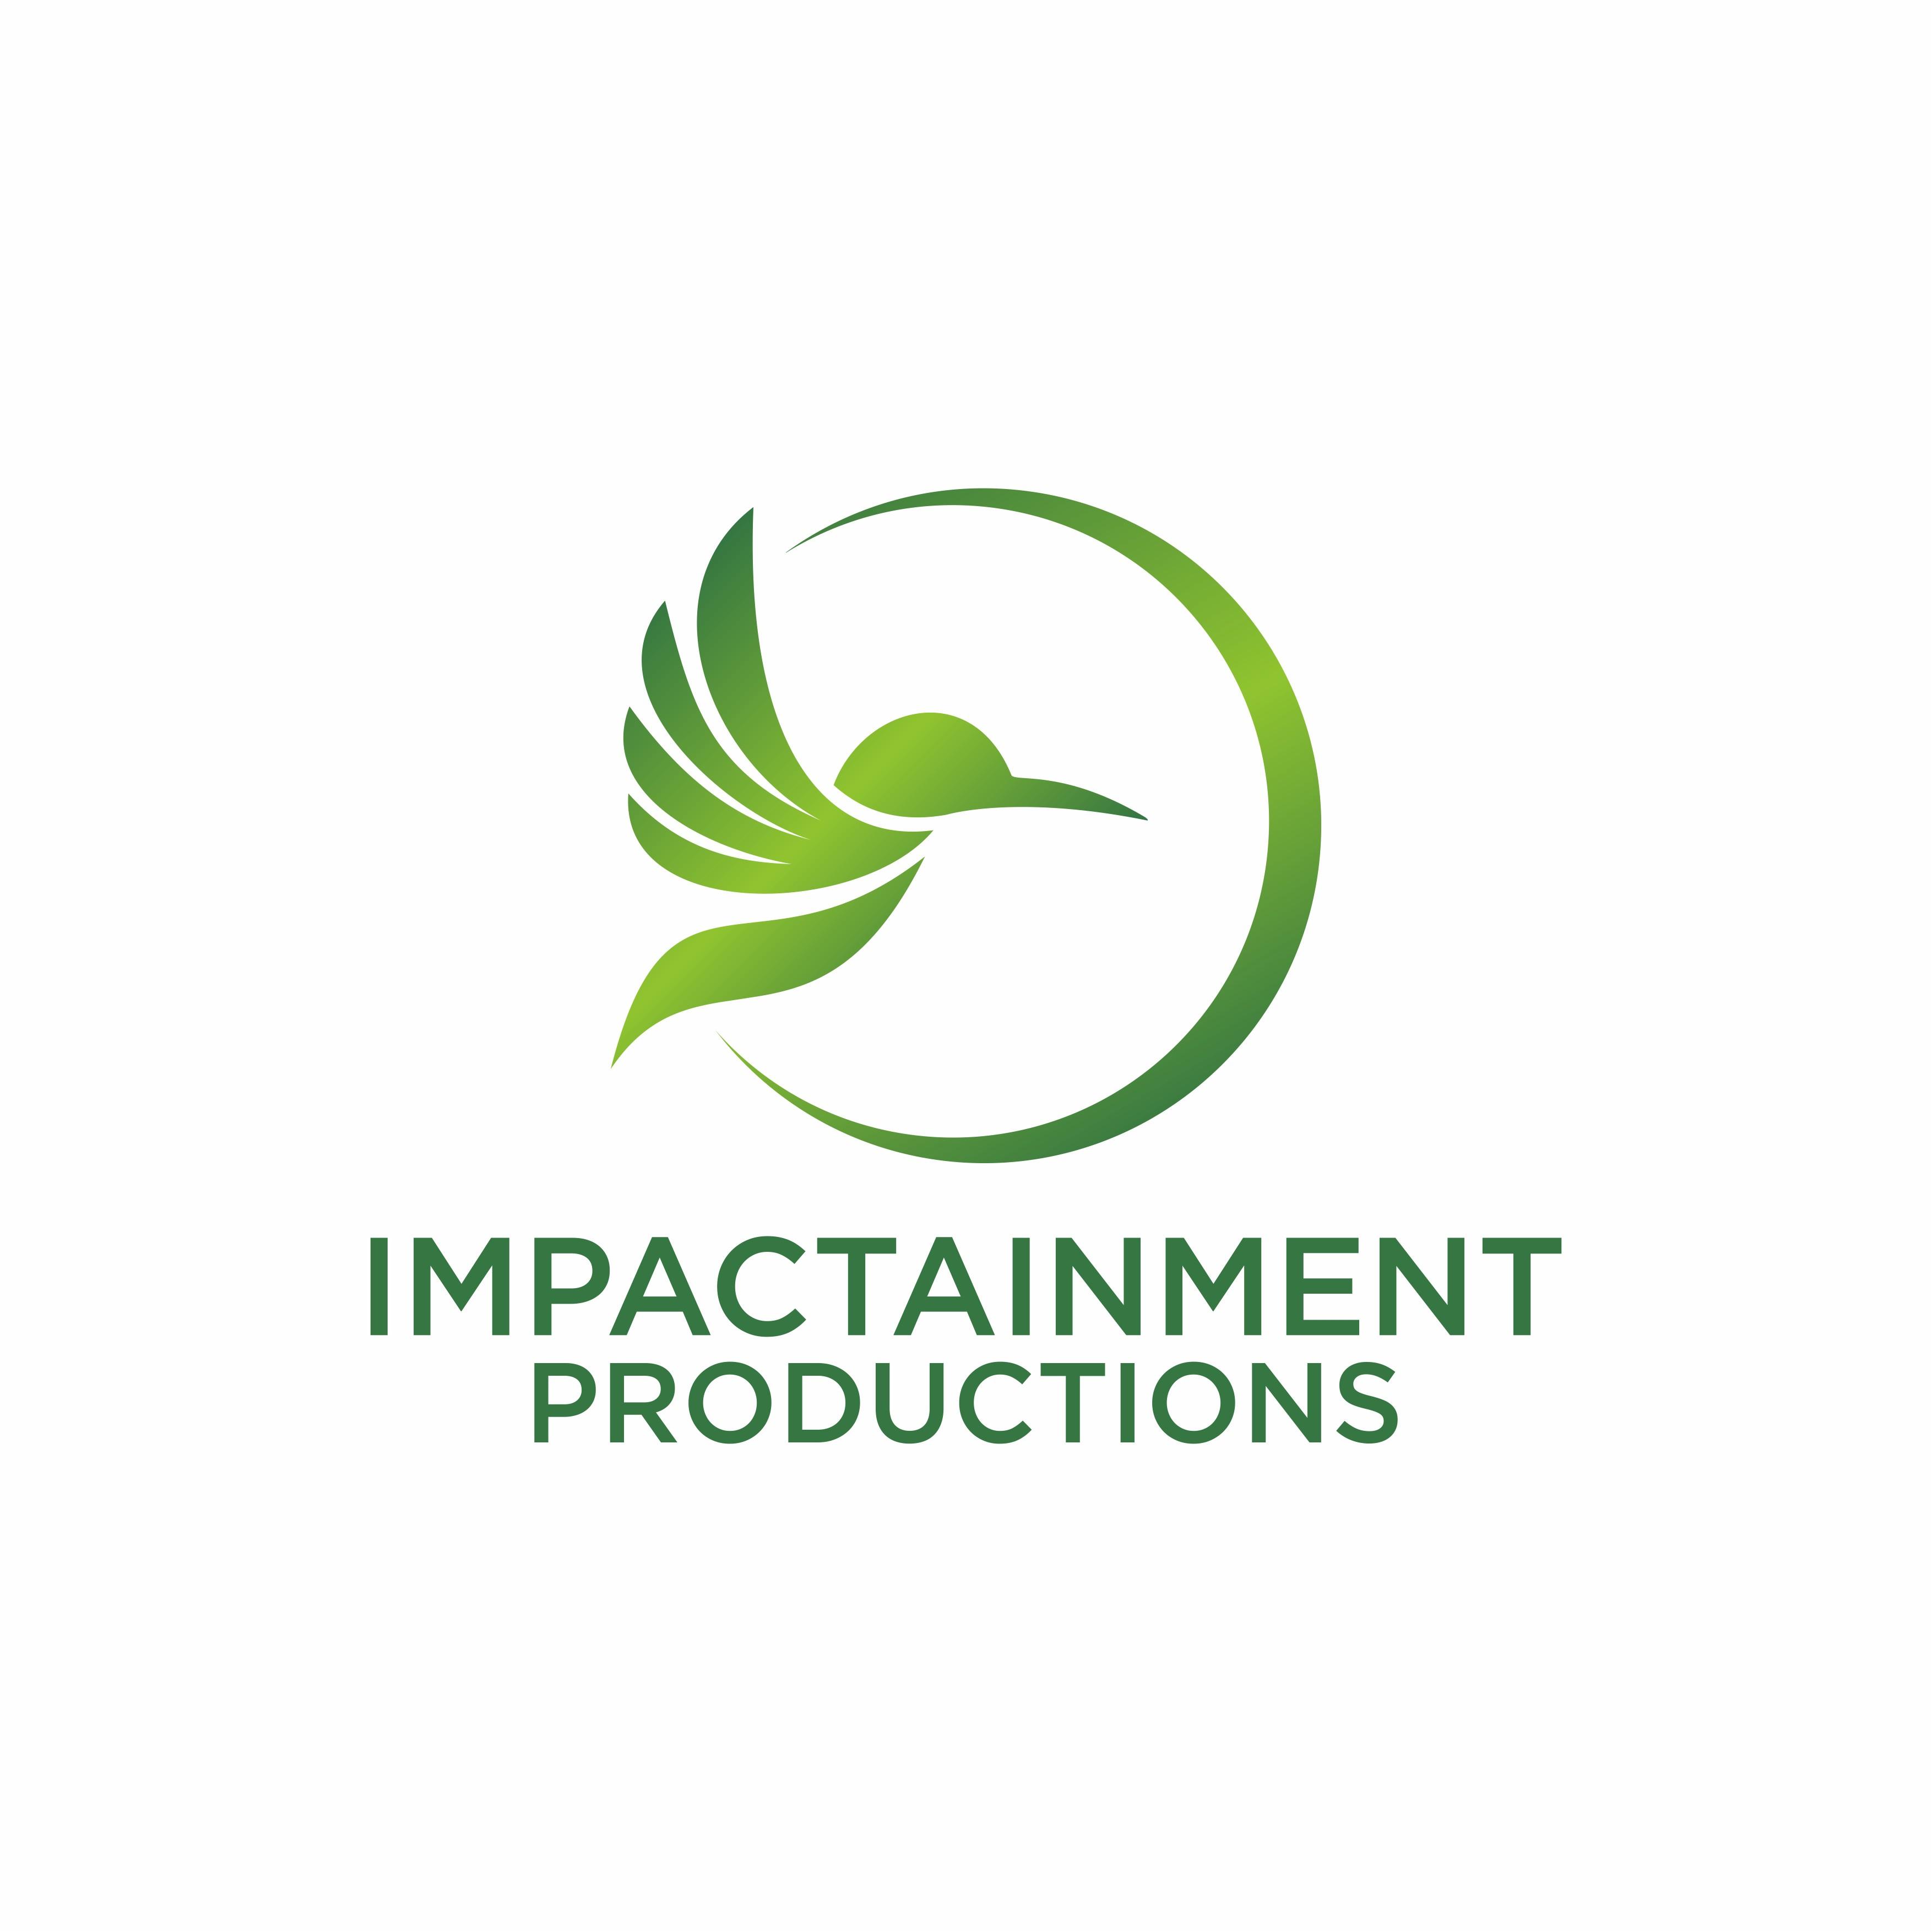 IMPACTAINMENT PRODUCTIONS